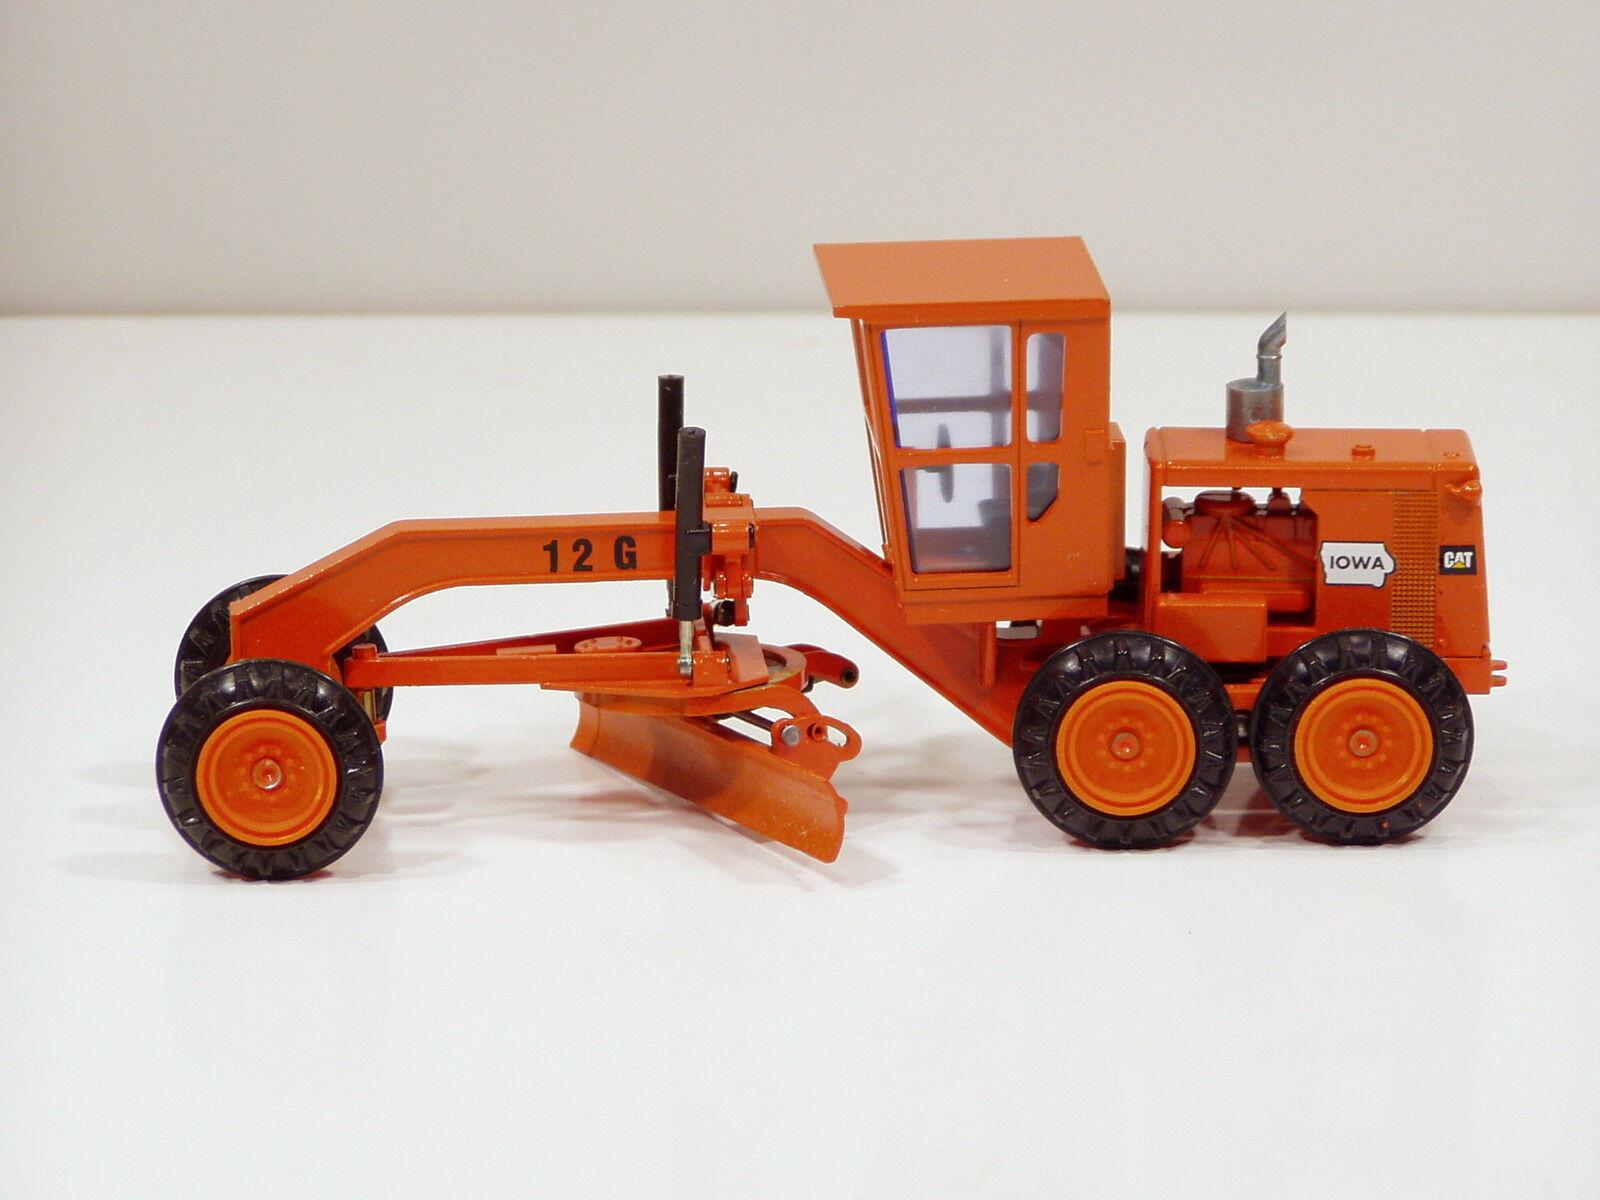 Caterpillar 12G grado - Iowa naranja -  - NZG  - sin Usar, En Caja